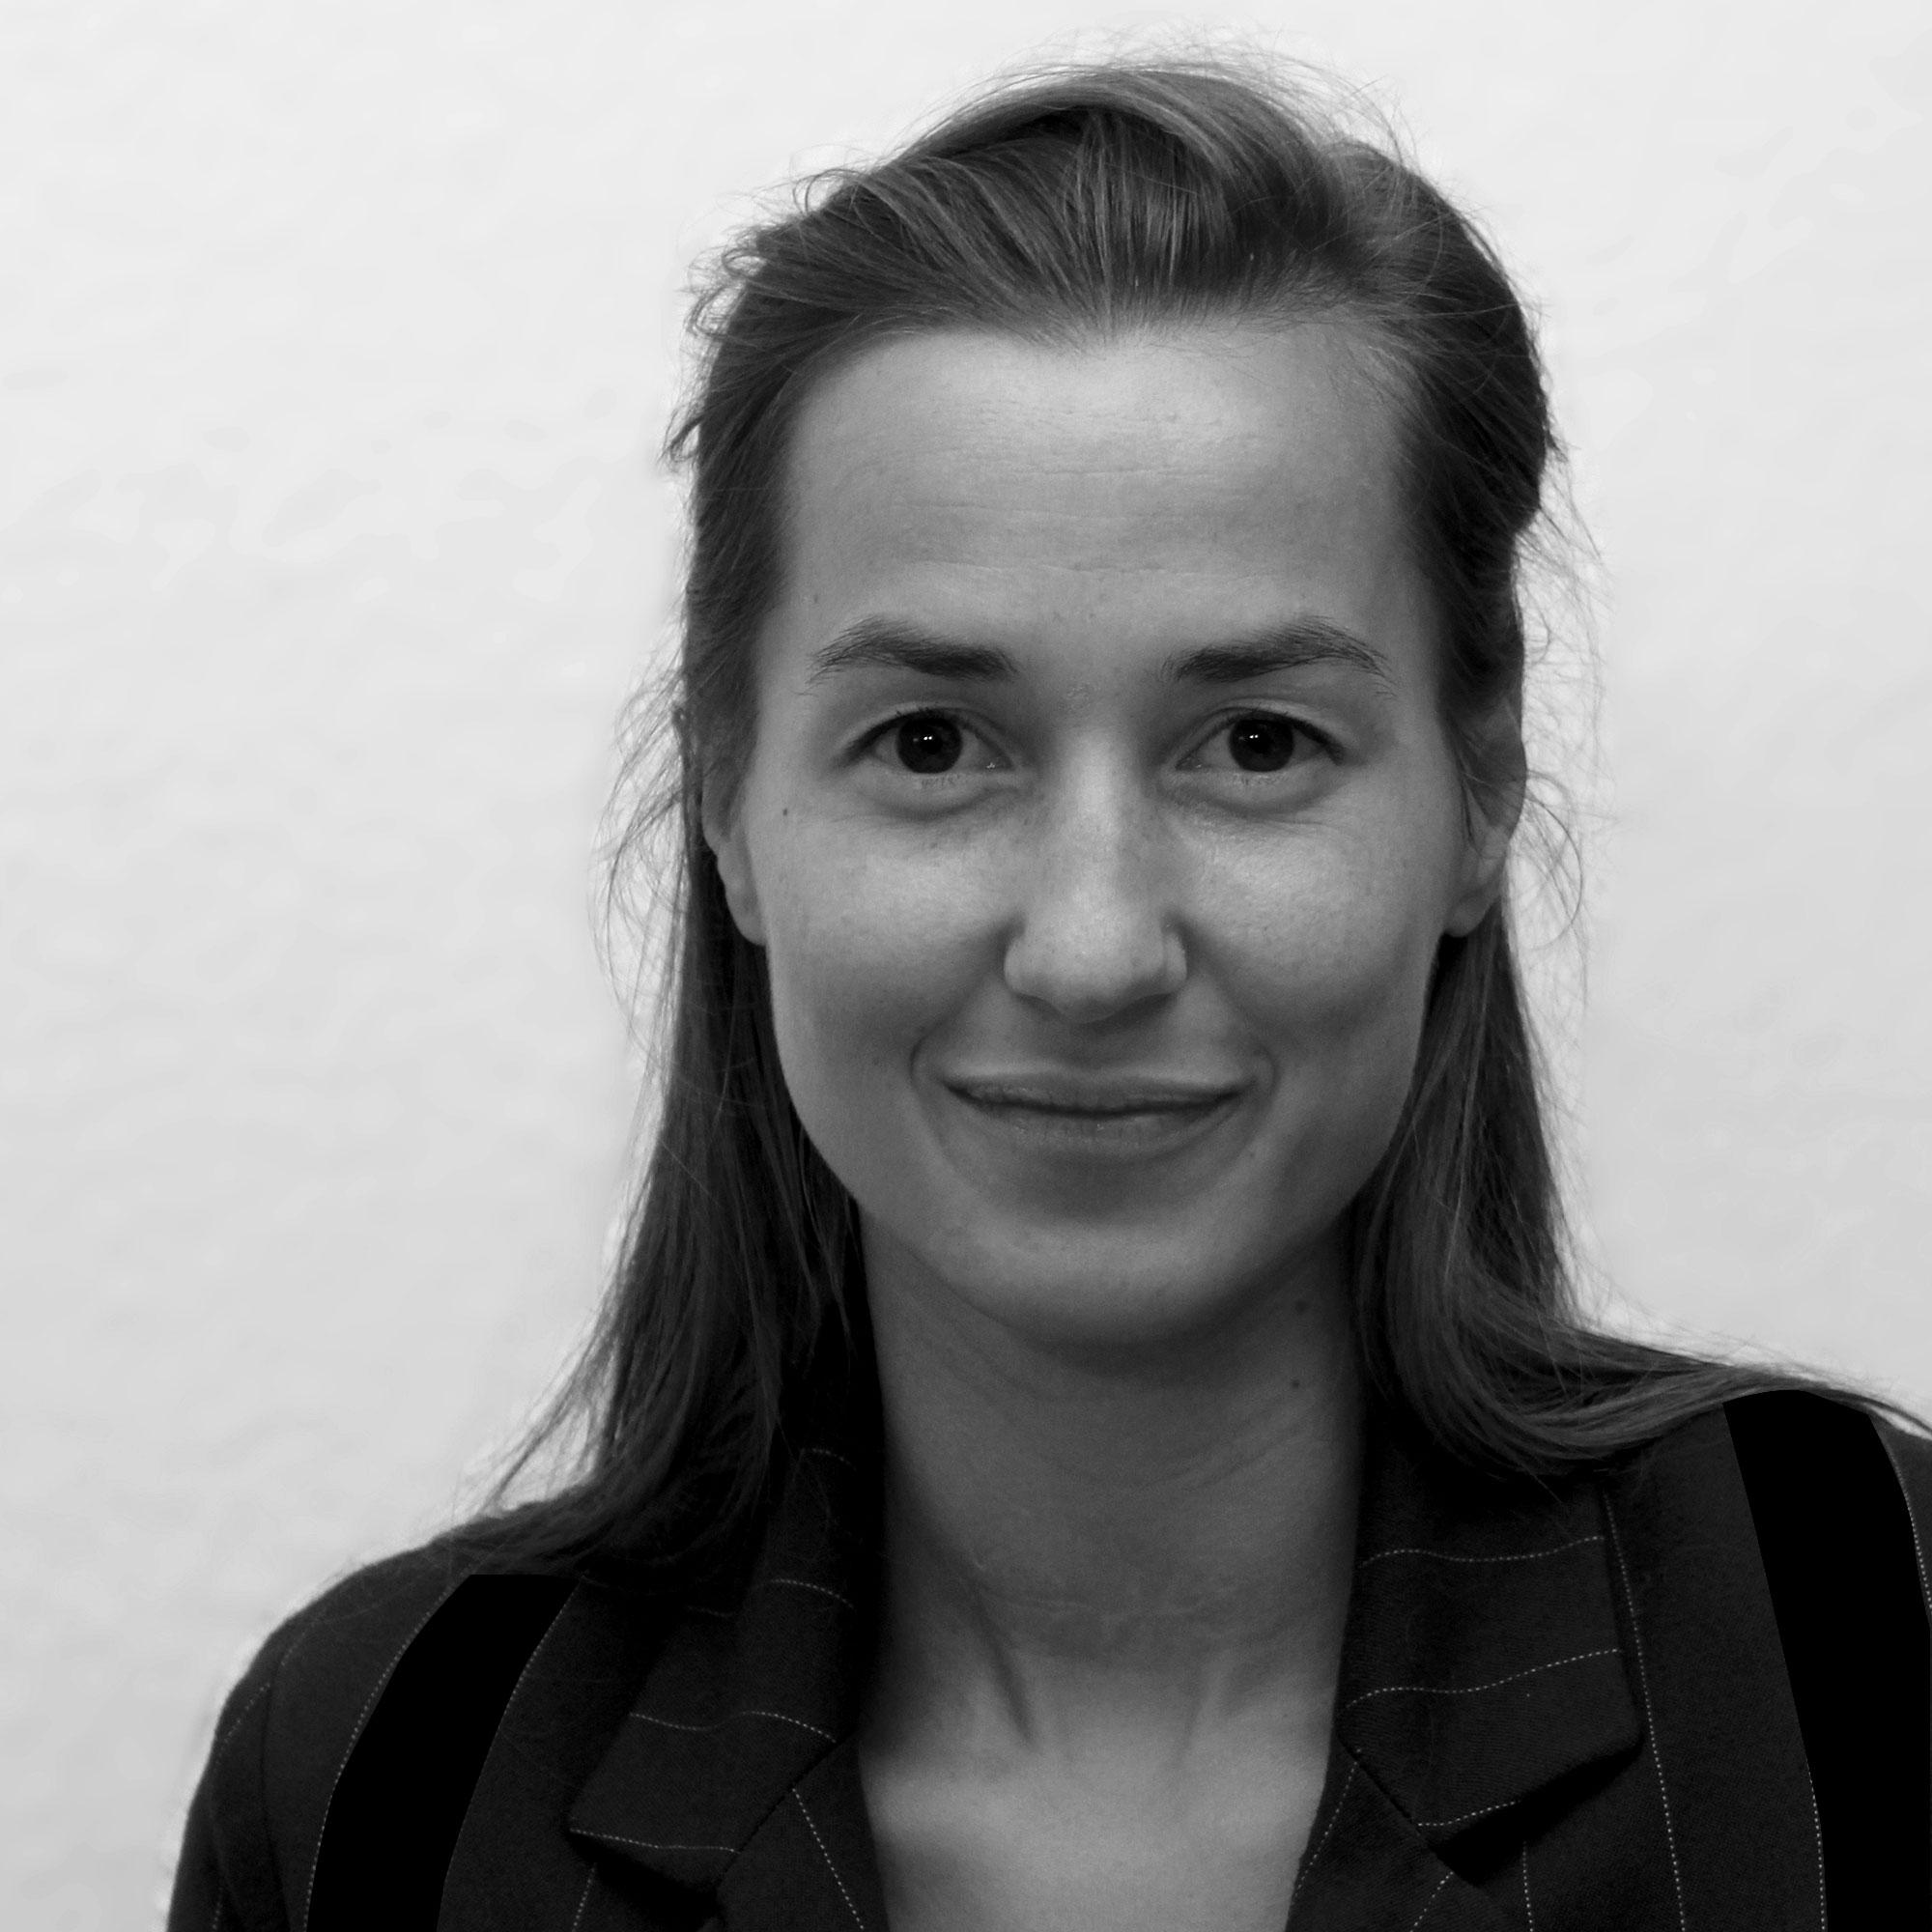 Jessica Rentzsch (Jezz)